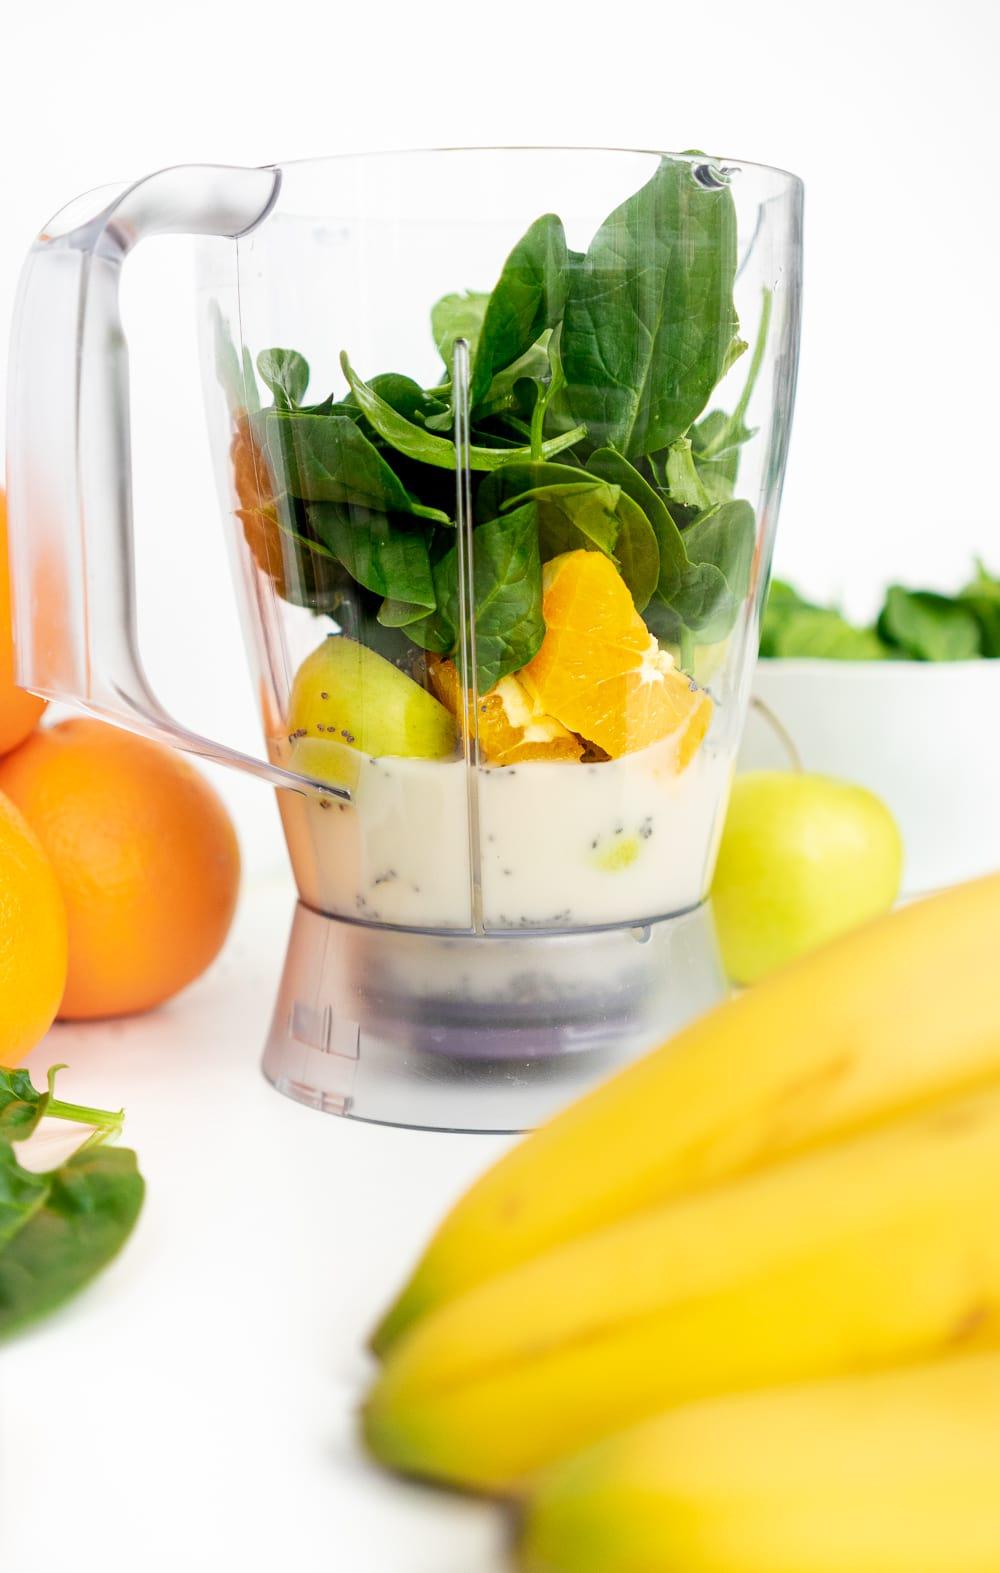 Green smoothie ingredients in a blender: spinach, orange, banana, chia seeds, green apple, oat milk